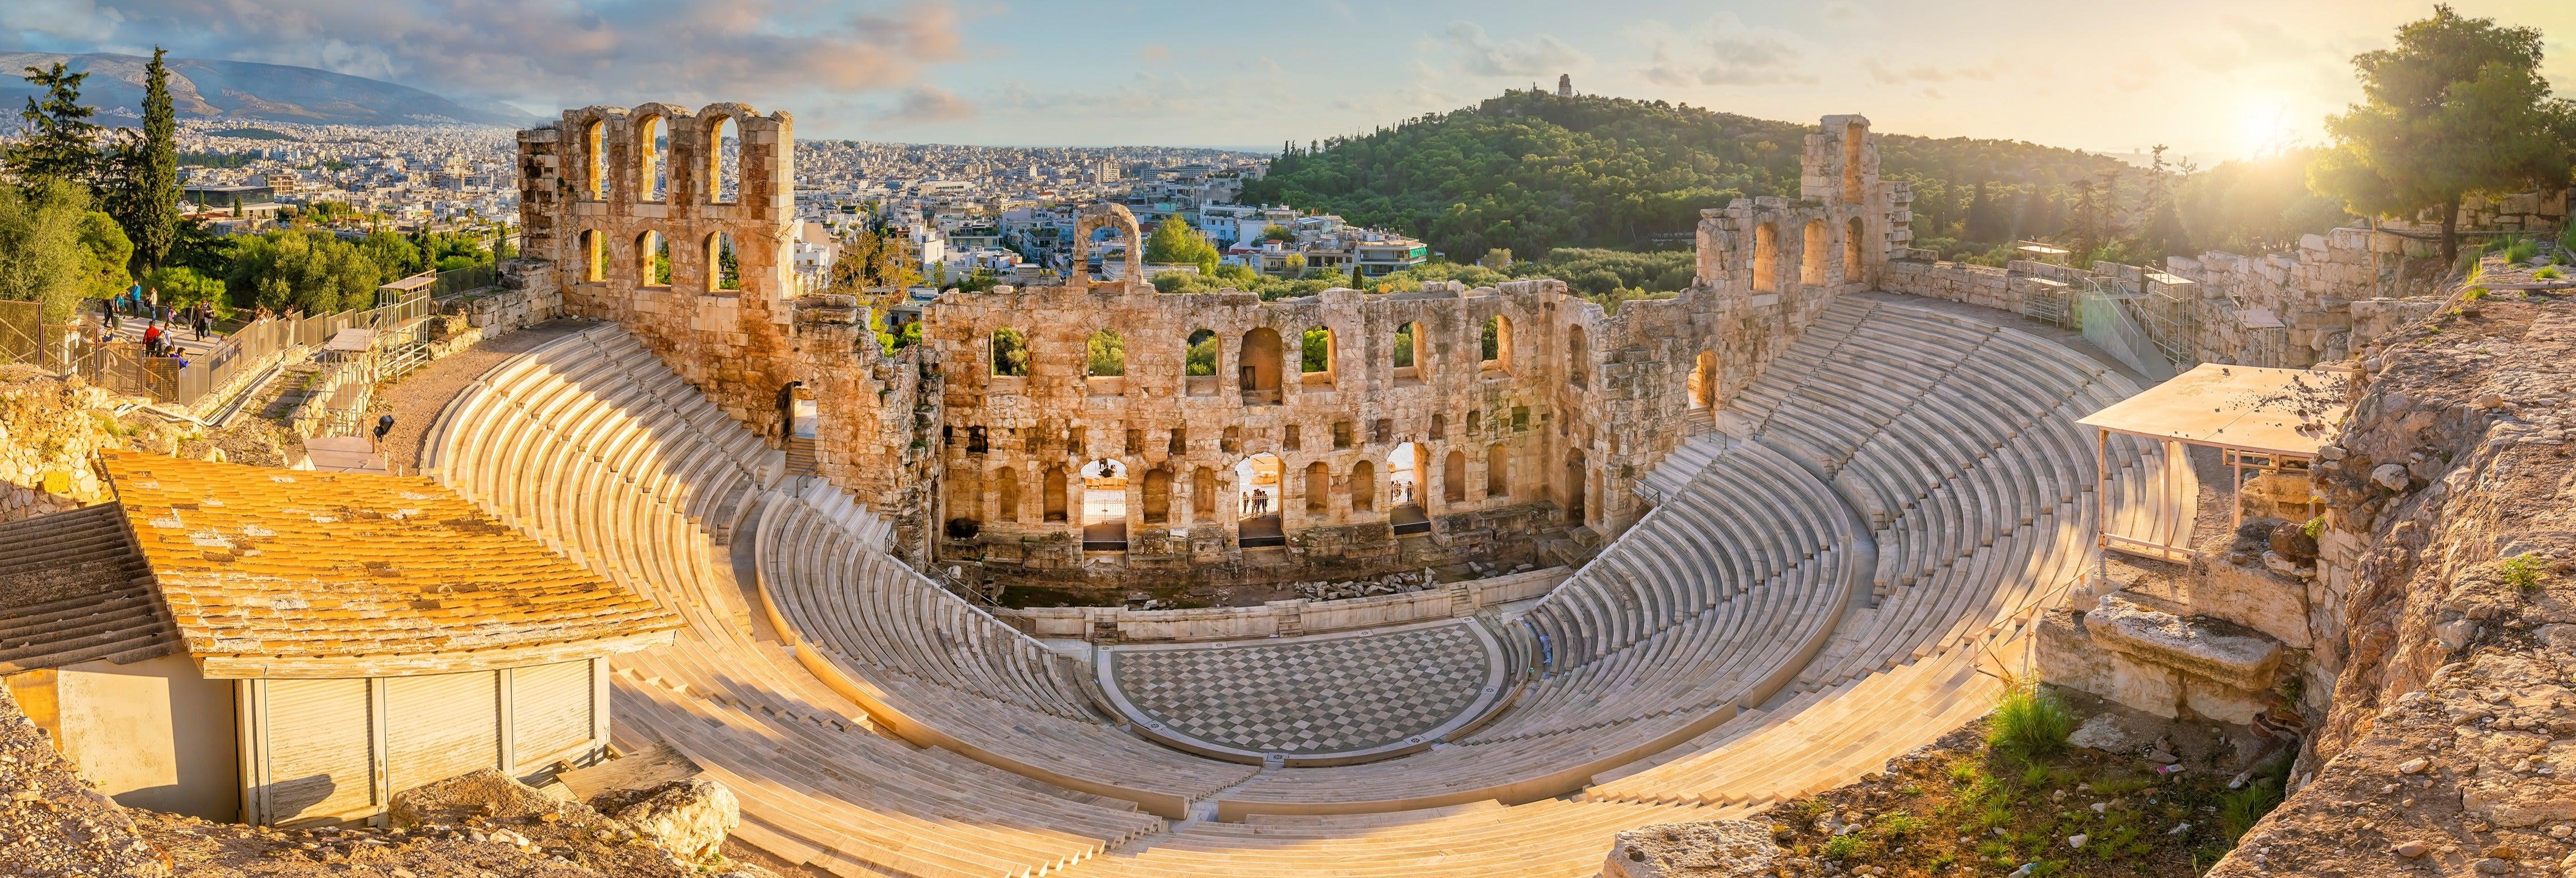 Tour por Atenas y visita a la Acrópolis